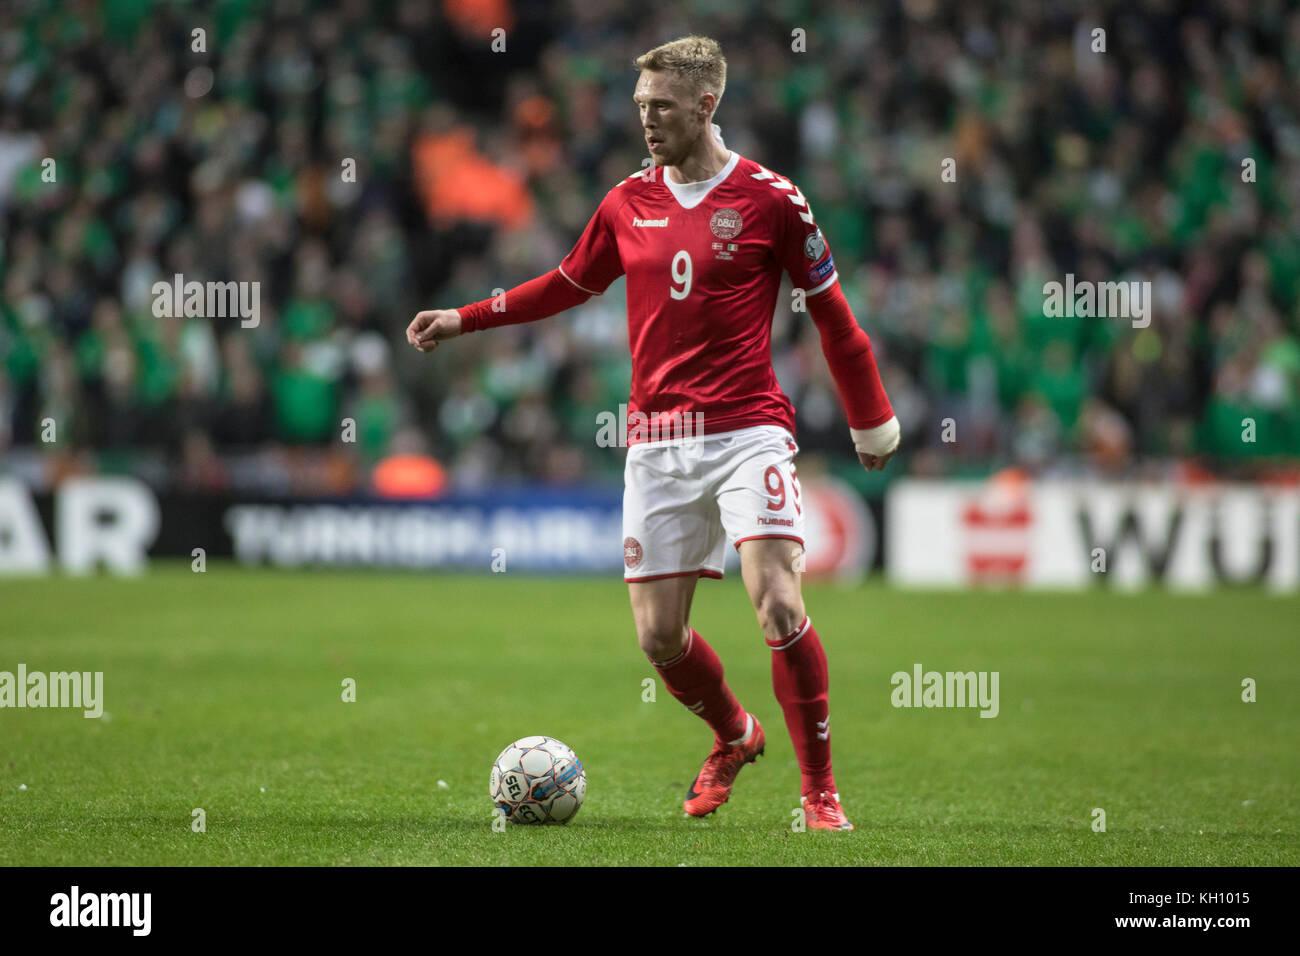 Denmark, Copenhagen - November 11, 2017. Nicolai Jørgensen (9) of Denmark seen during the World Cup playoff - Stock Image